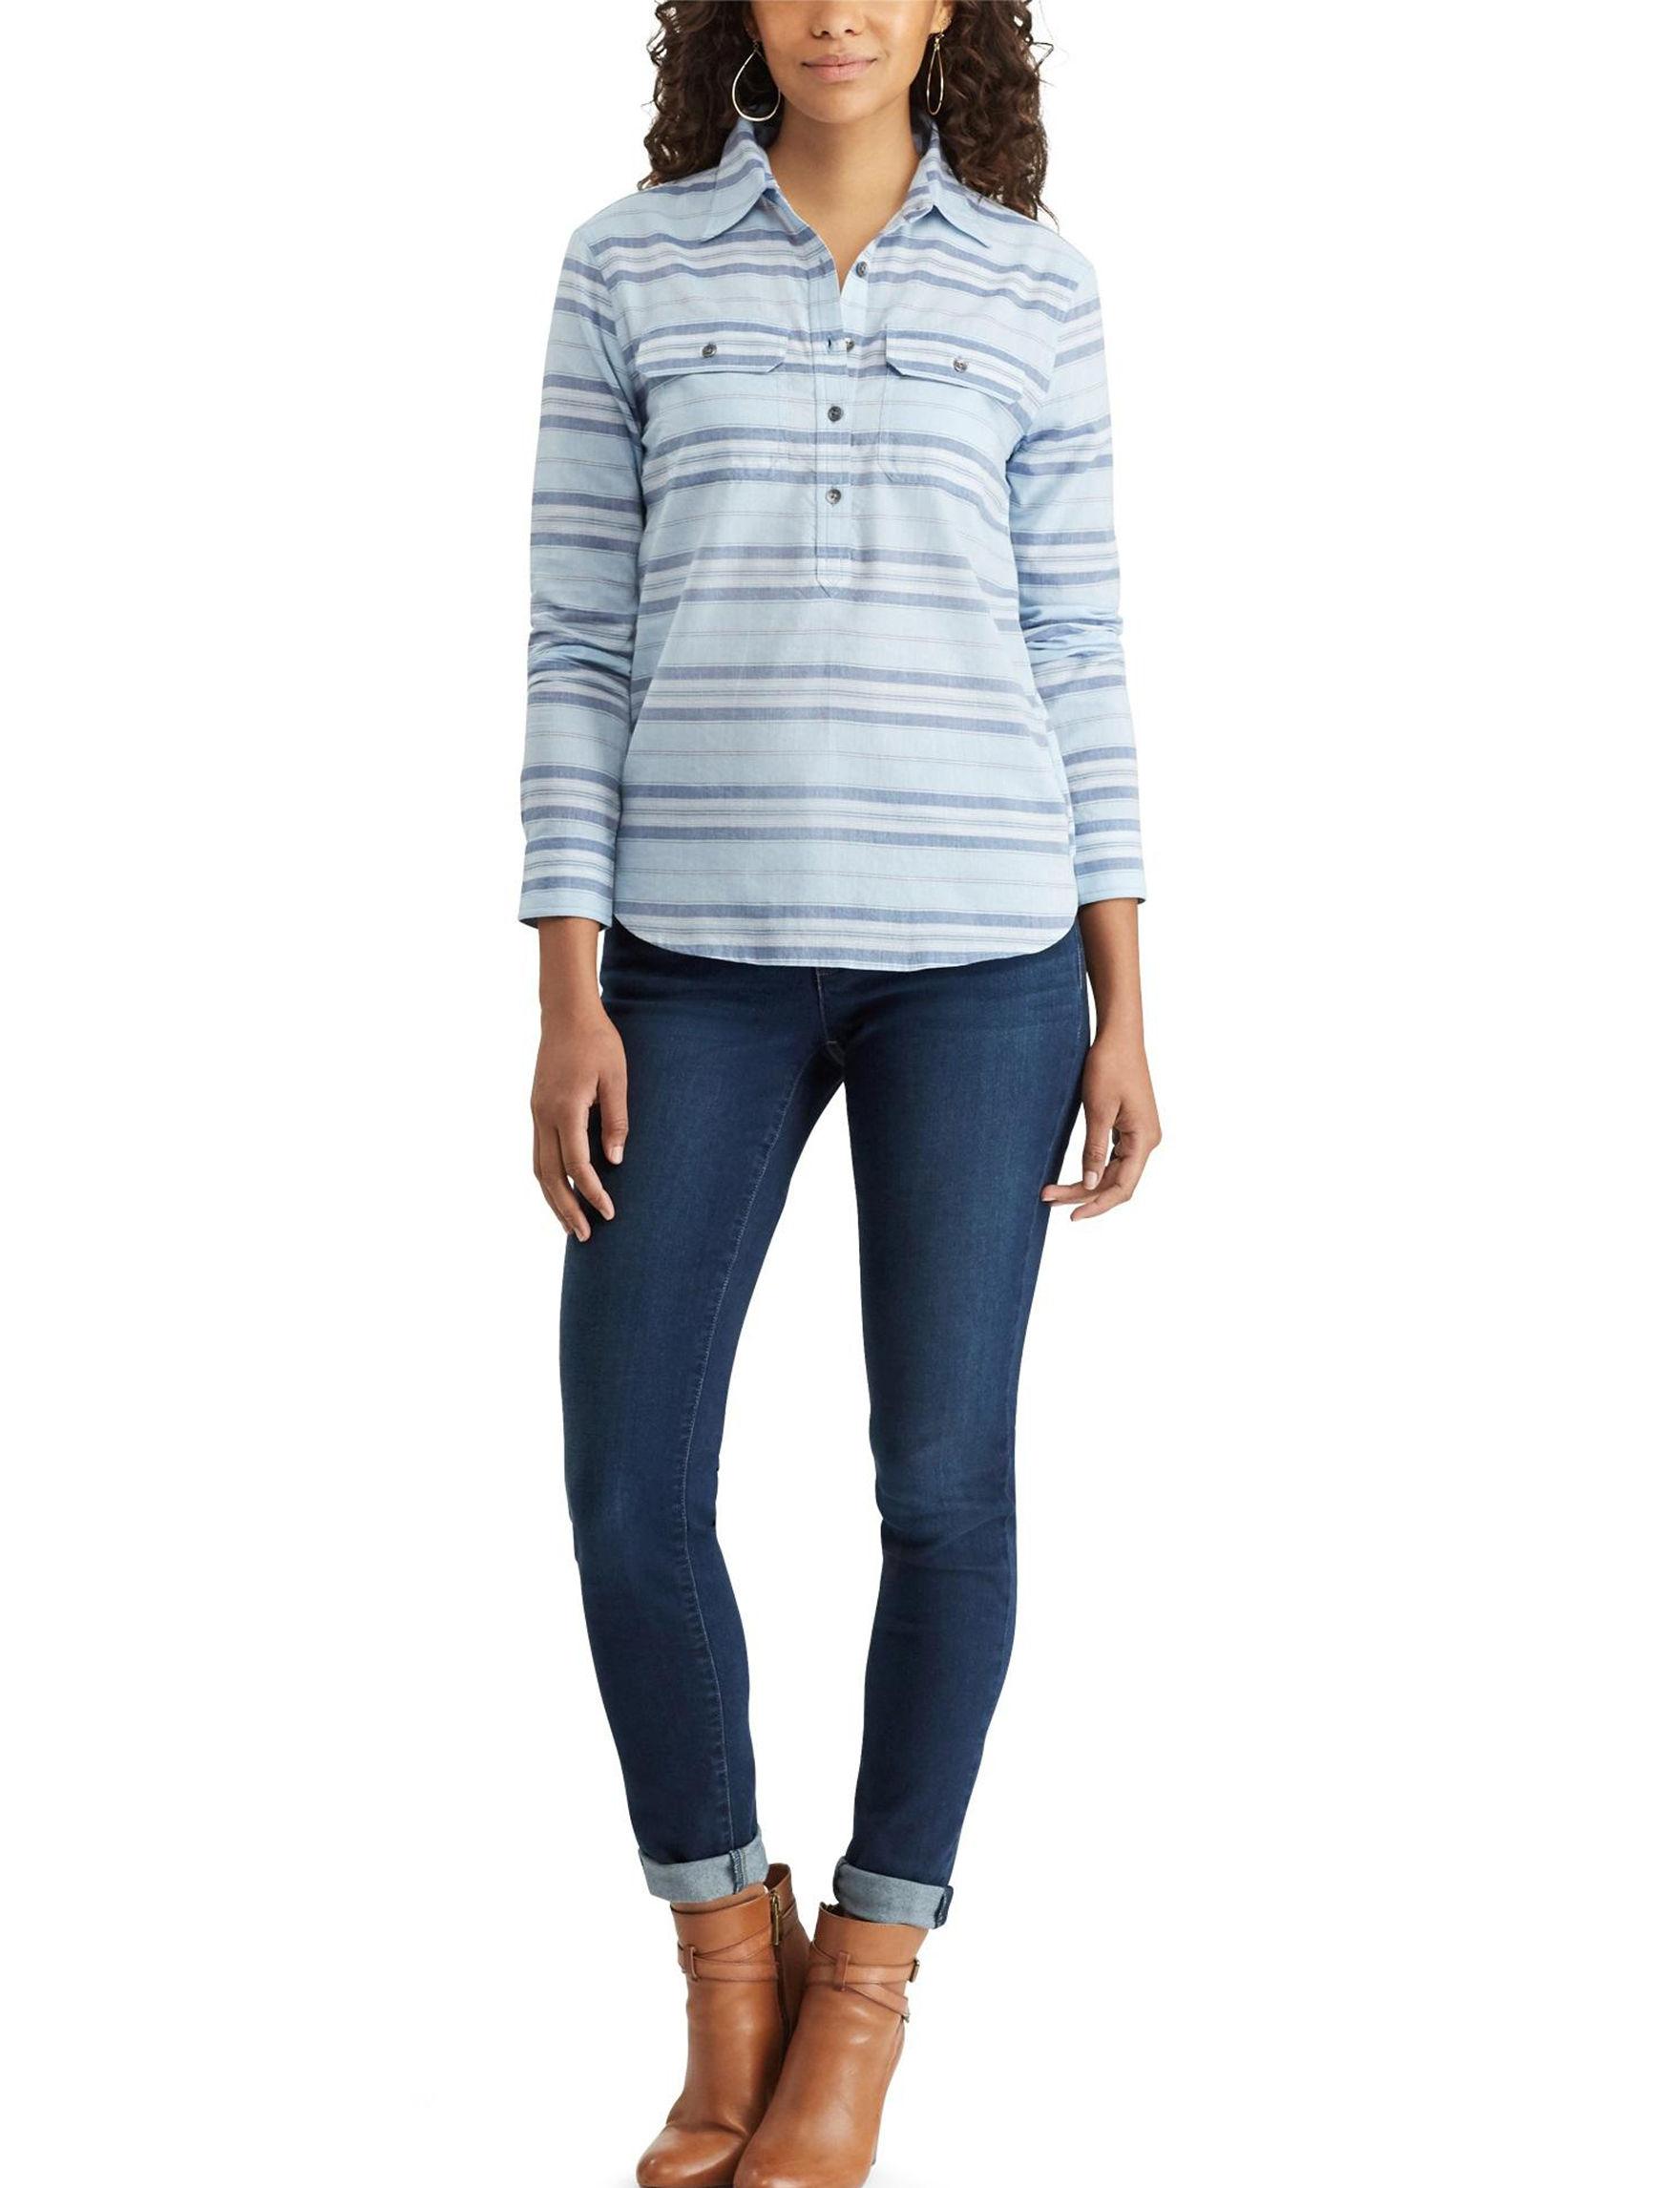 Chaps Blue Multi Shirts & Blouses